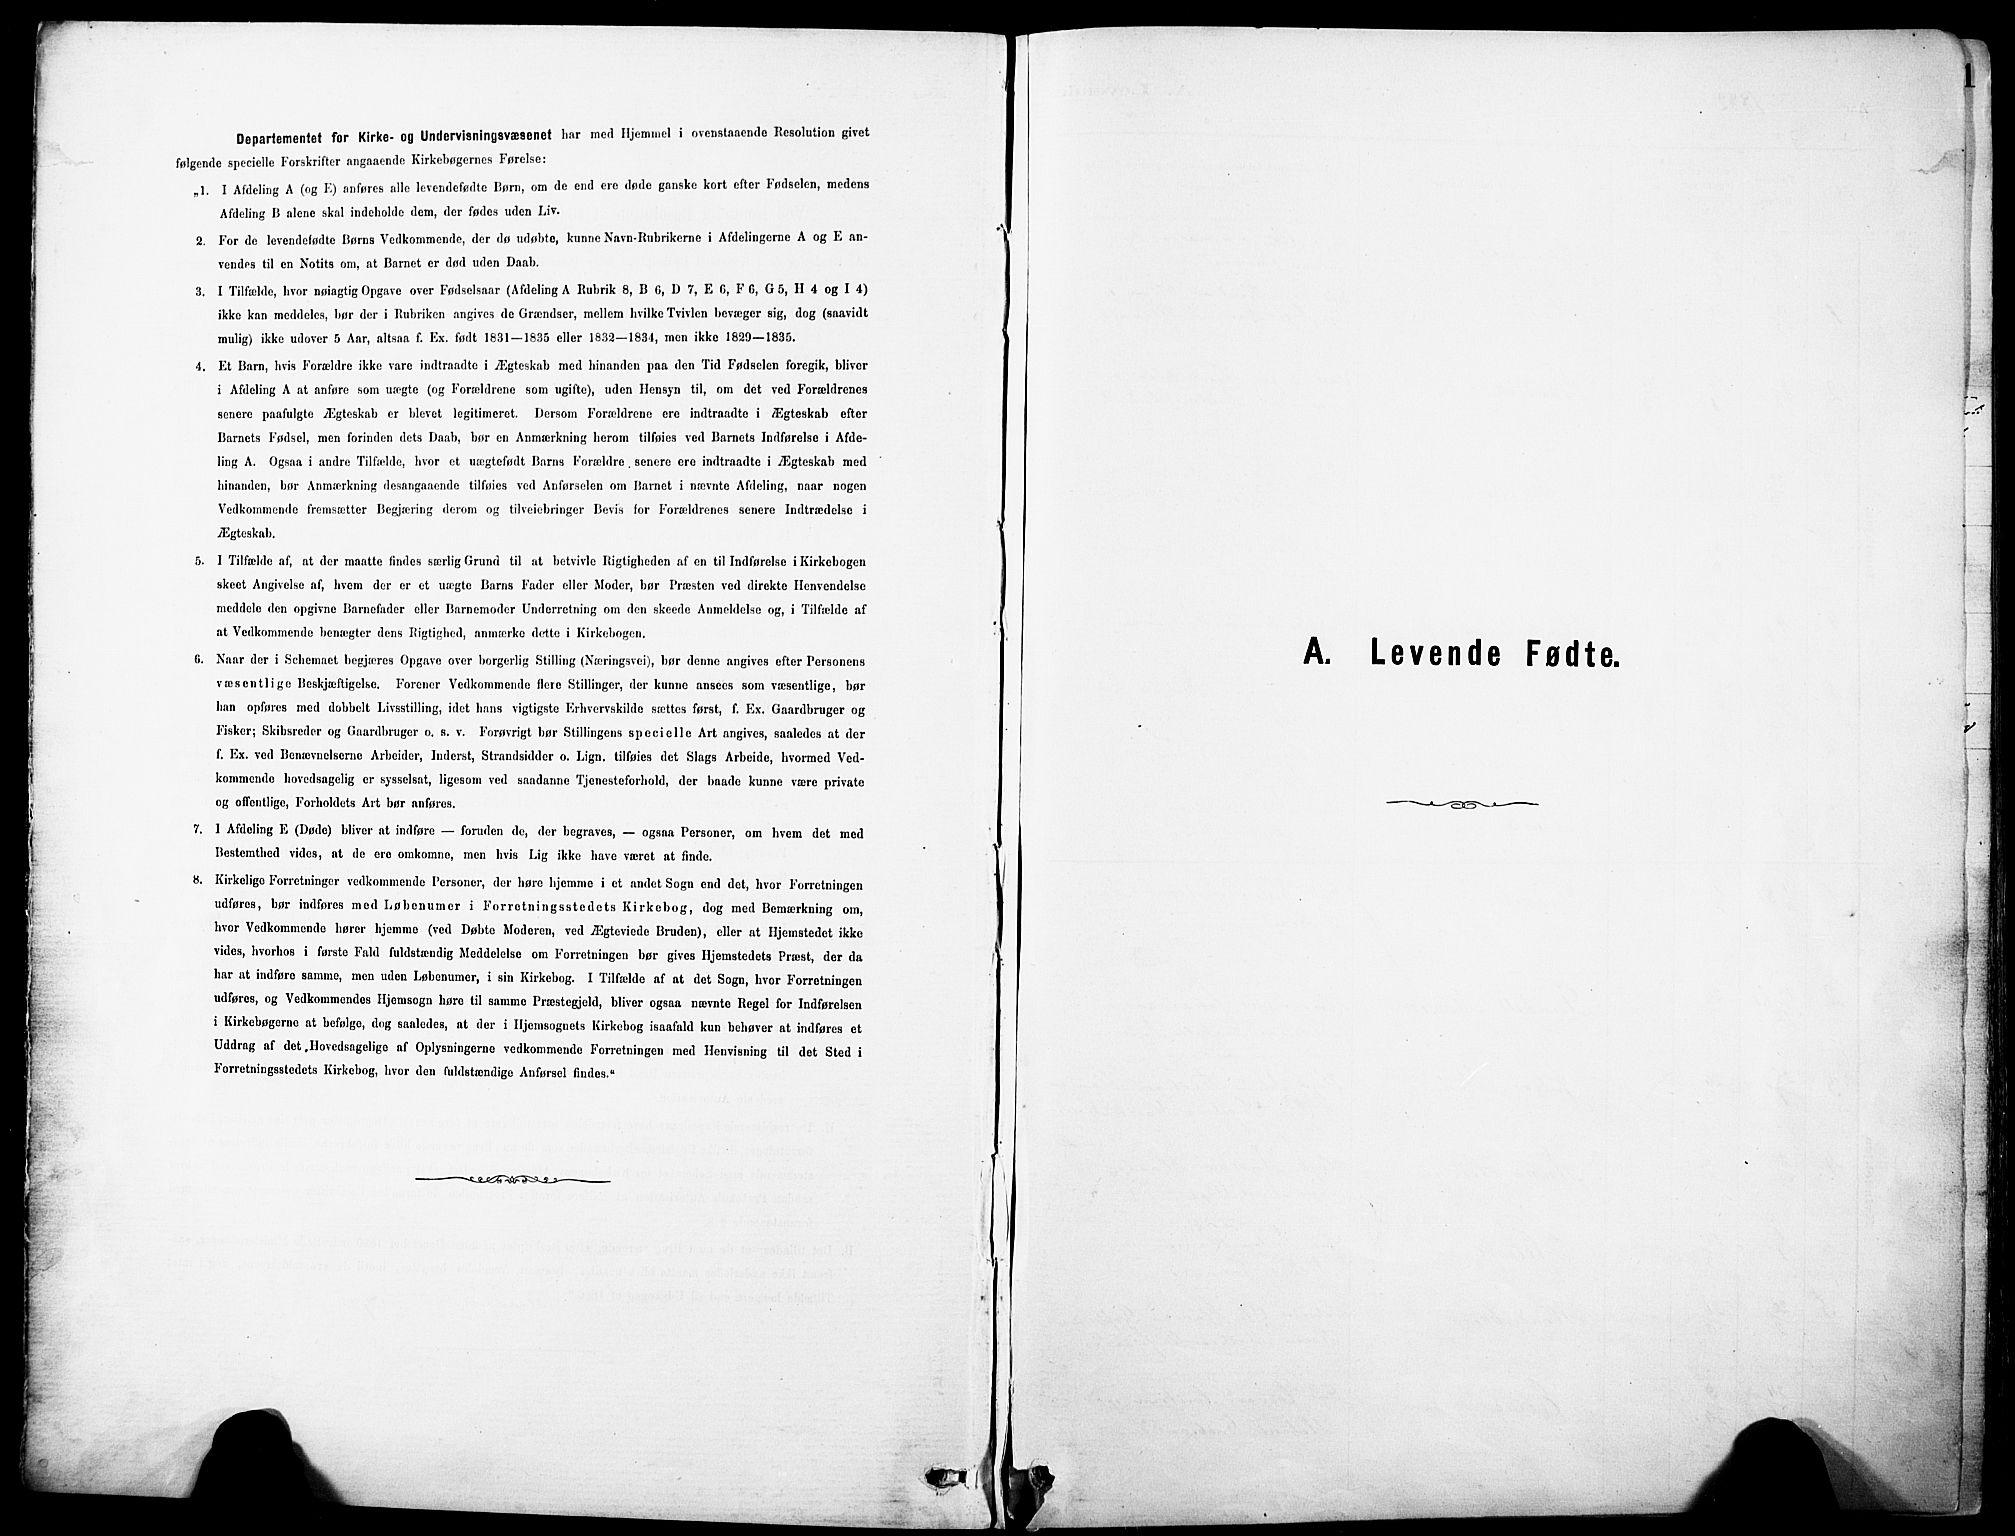 SAH, Nordre Land prestekontor, Ministerialbok nr. 5, 1882-1903